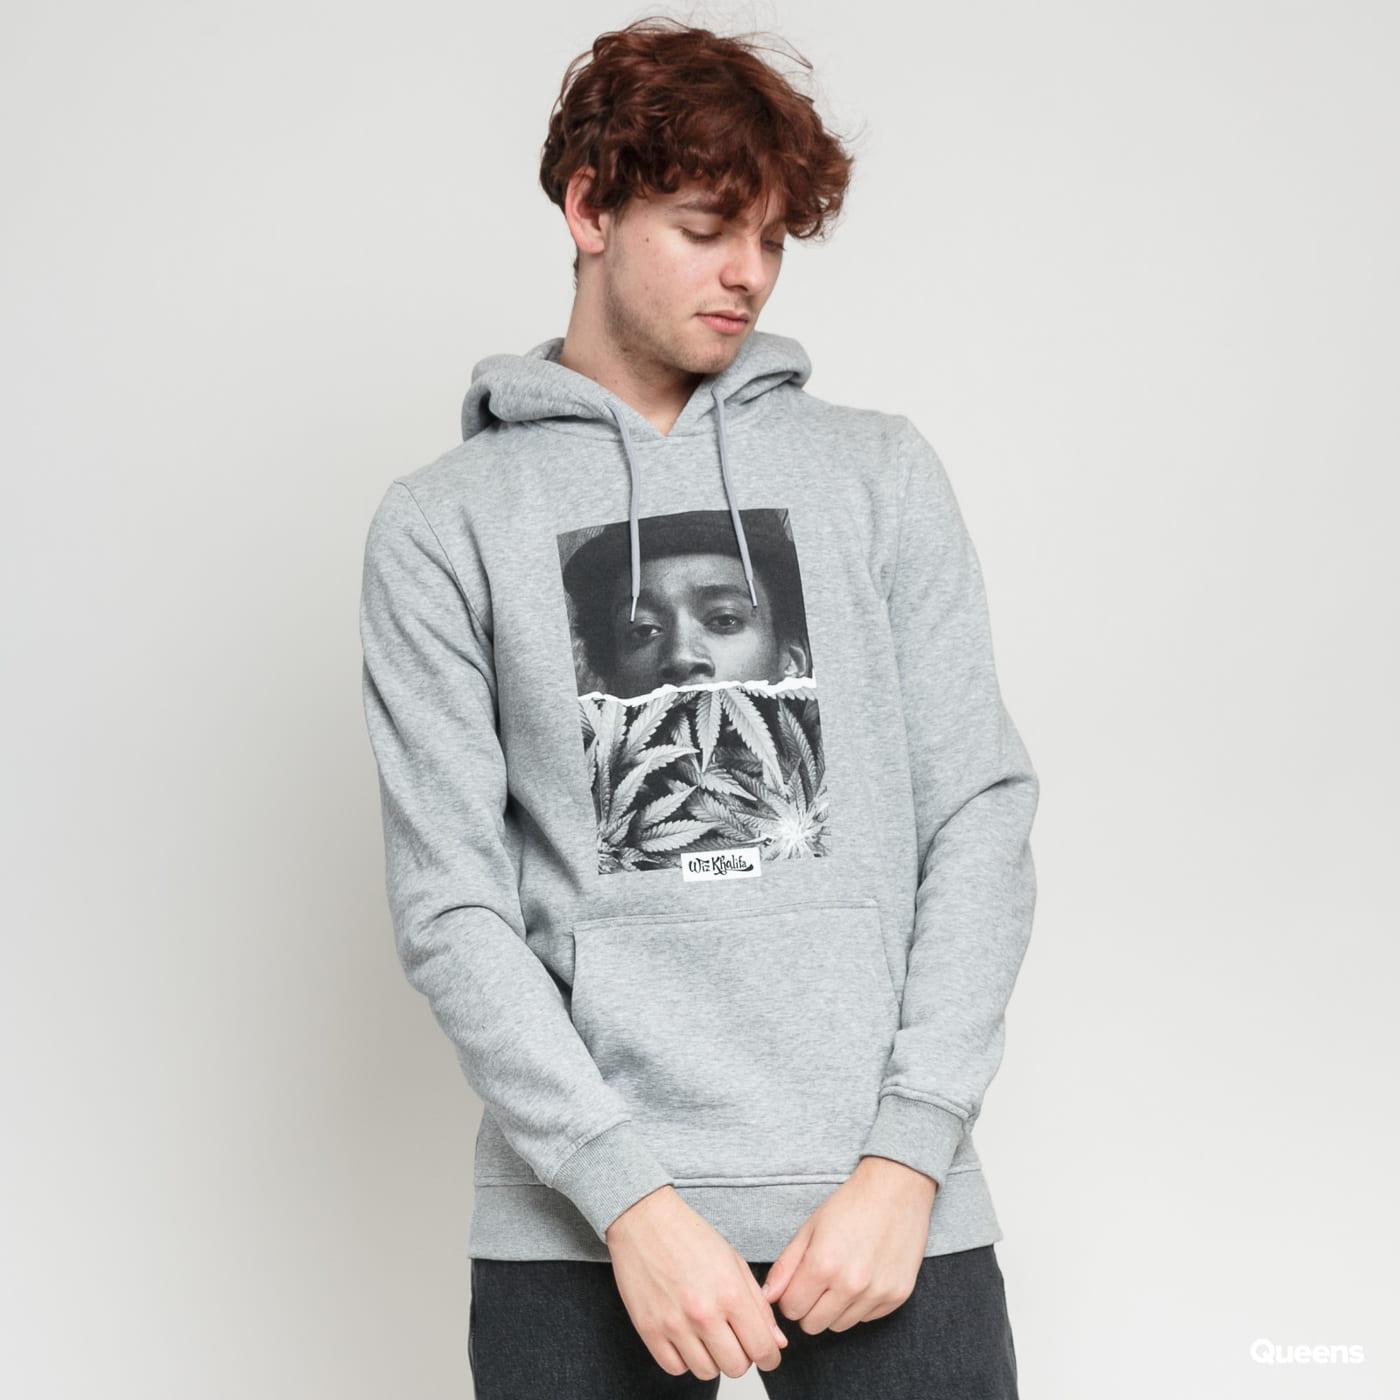 Urban Classics Wiz Khalifa Face Hoody grey melange